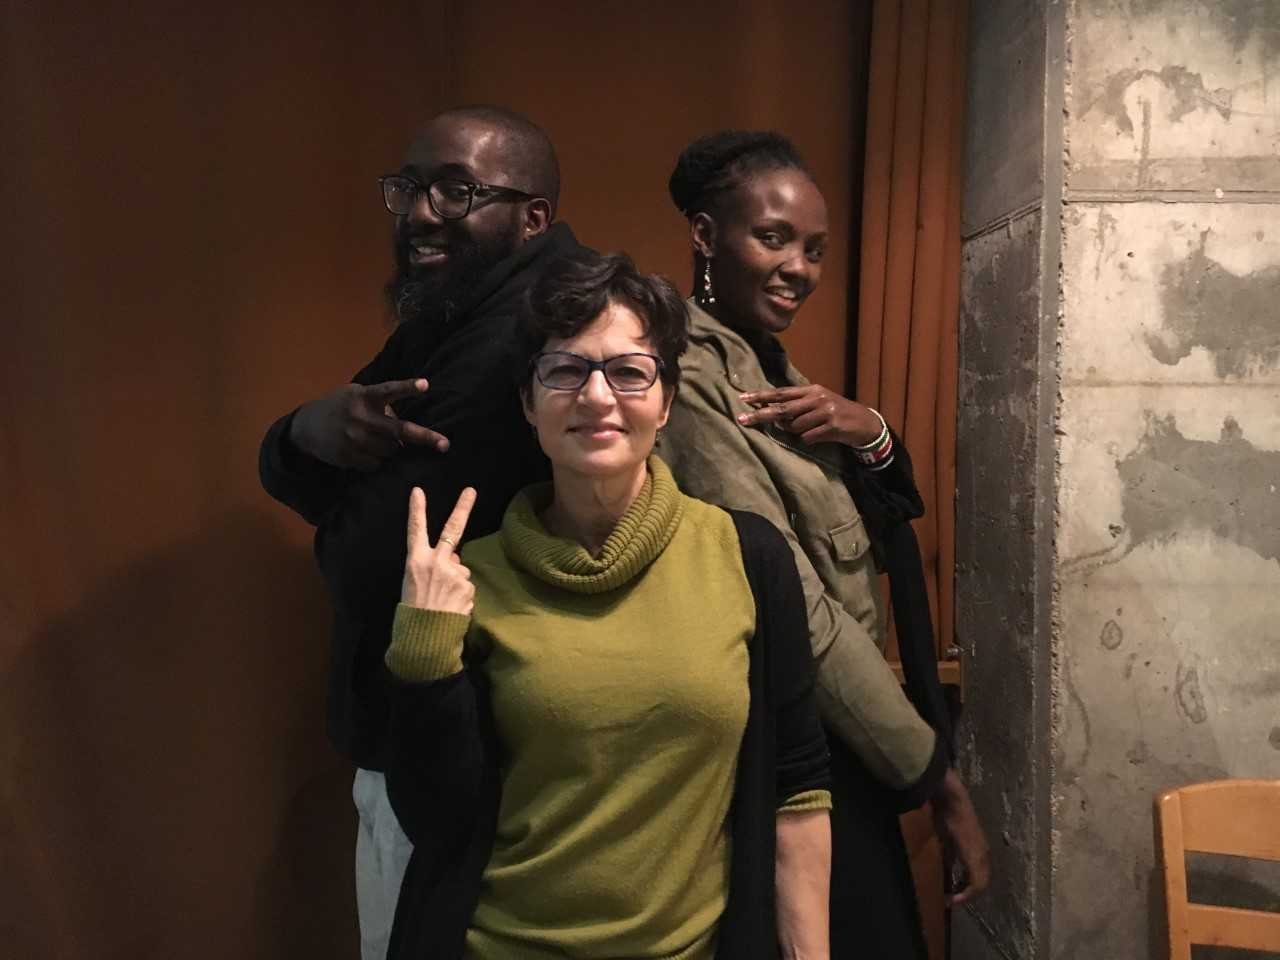 Michael Ford, Hip Hop Architecture; Lesley Sager, Merry Go Strong; Dr. Josephine Kulea, Samburu Girls Foundation